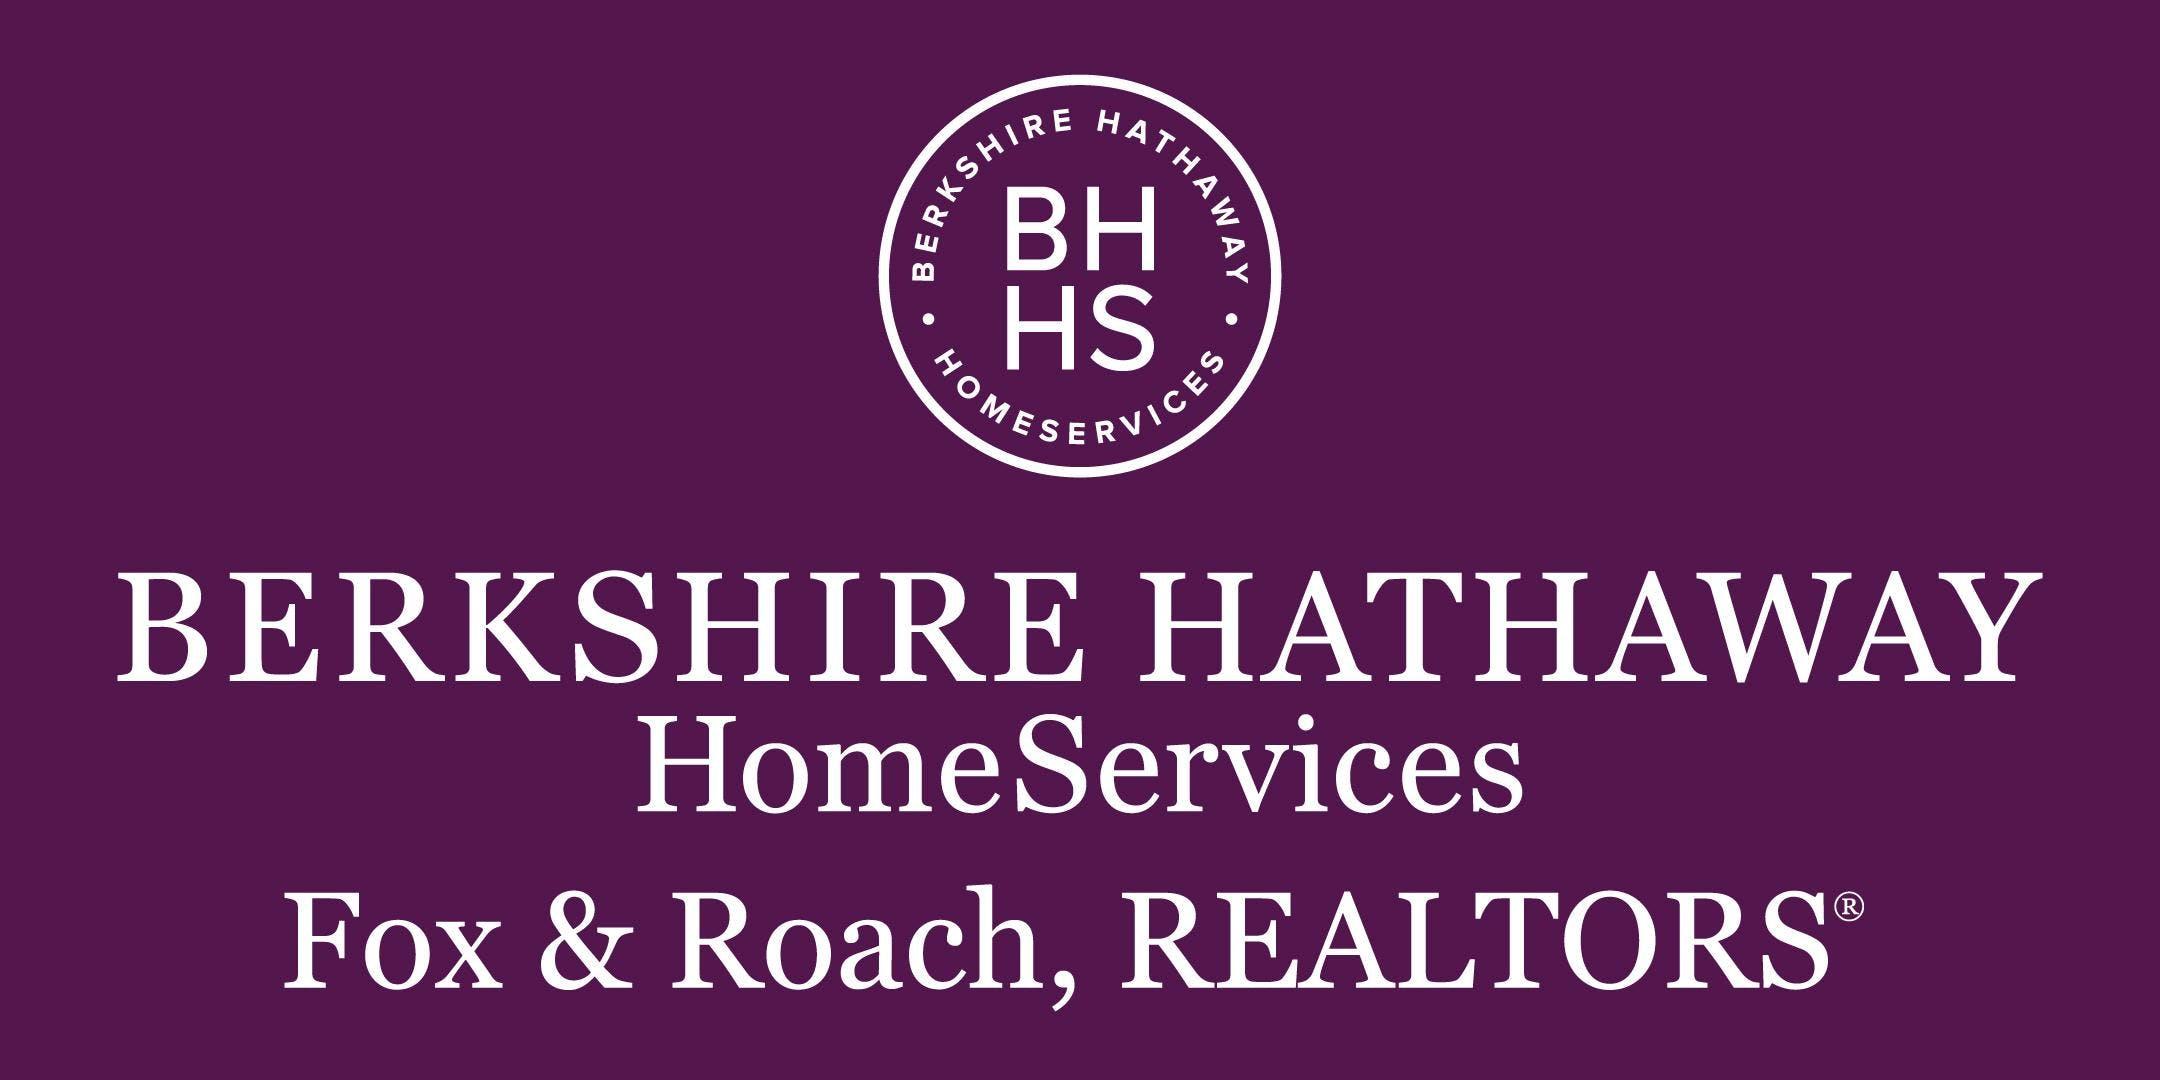 Listing and Leasing Rental Property in Delaware Newark 6252018 - 930 - 1130